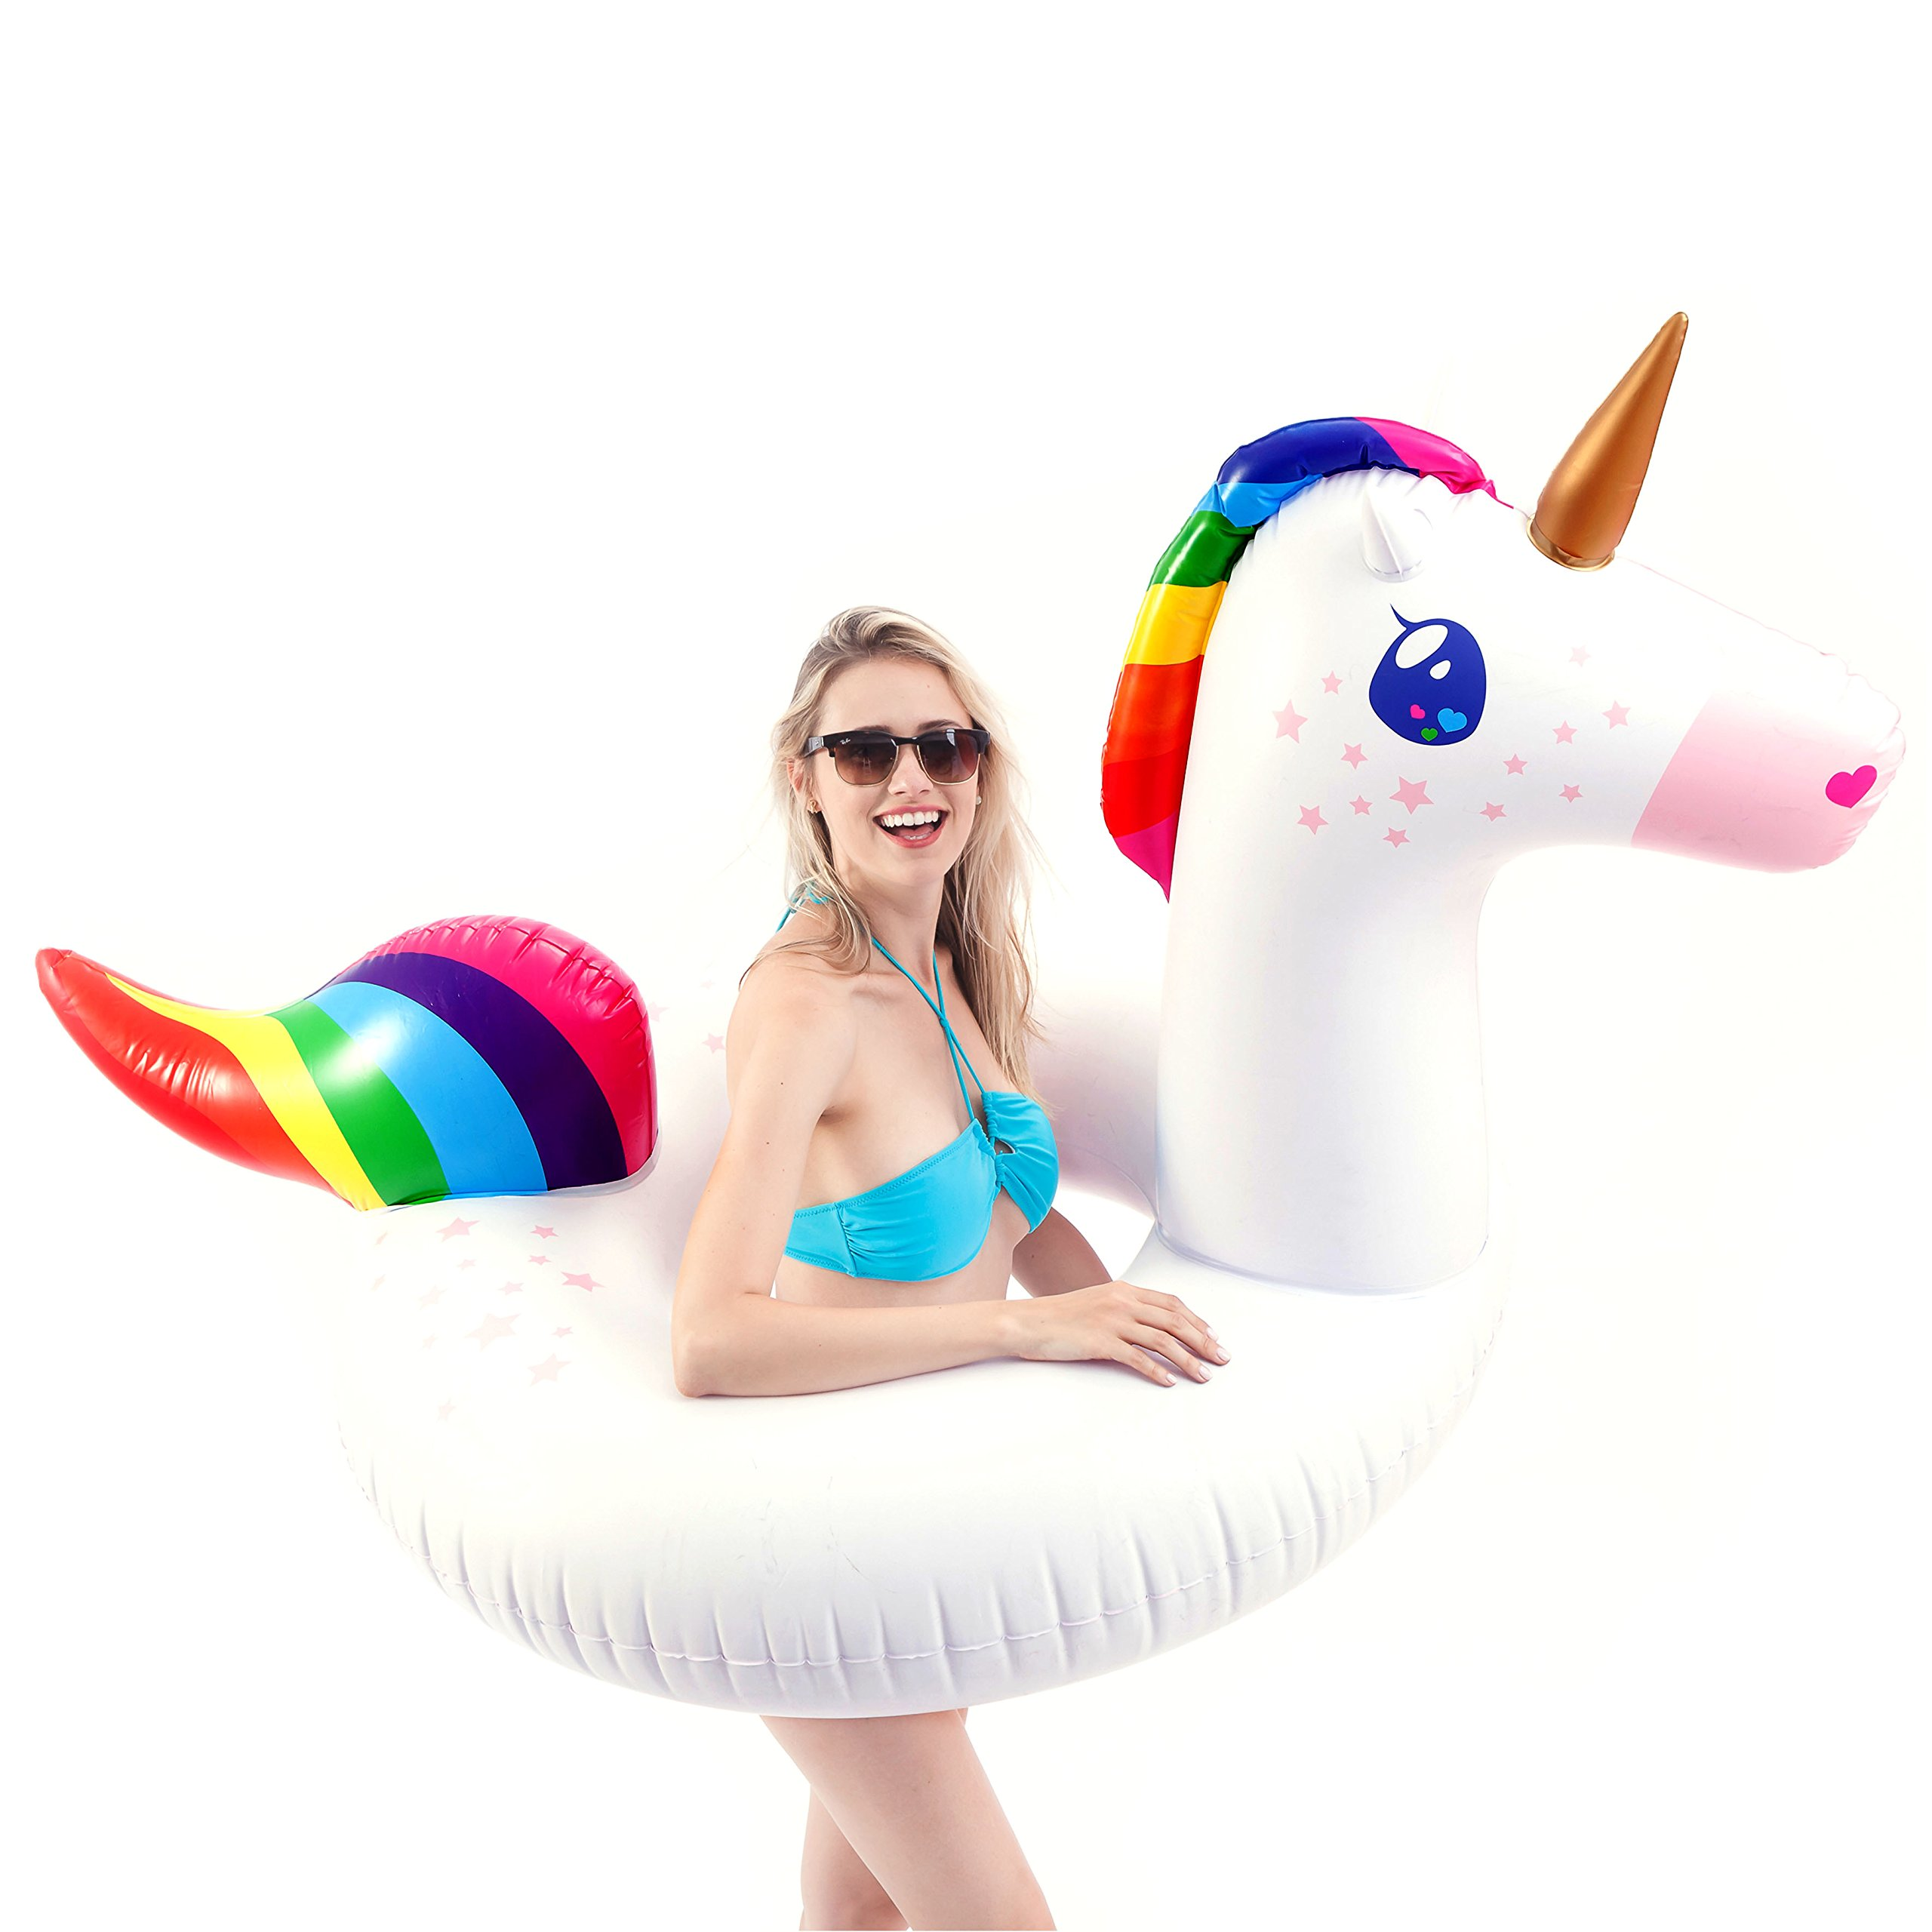 JOYIN Gorgeous Inflatable Unicorn Tube, Pool Float, Fun Beach Floaties, Swim Party Toys, Summer Pool Raft Lounge for Adults & Kids